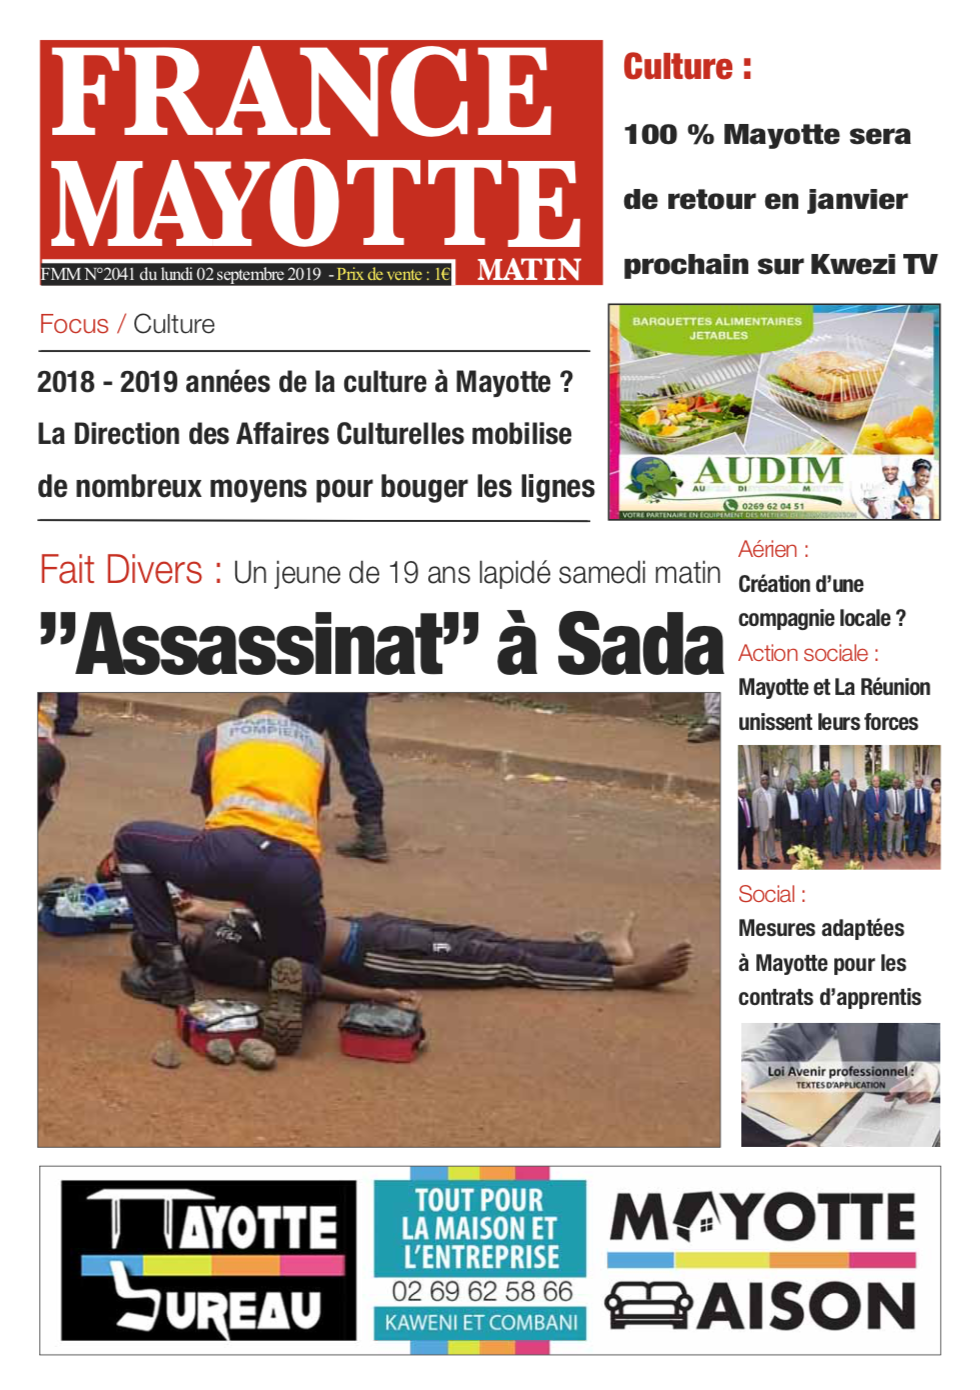 France Mayotte Lundi 2 septembre 2019